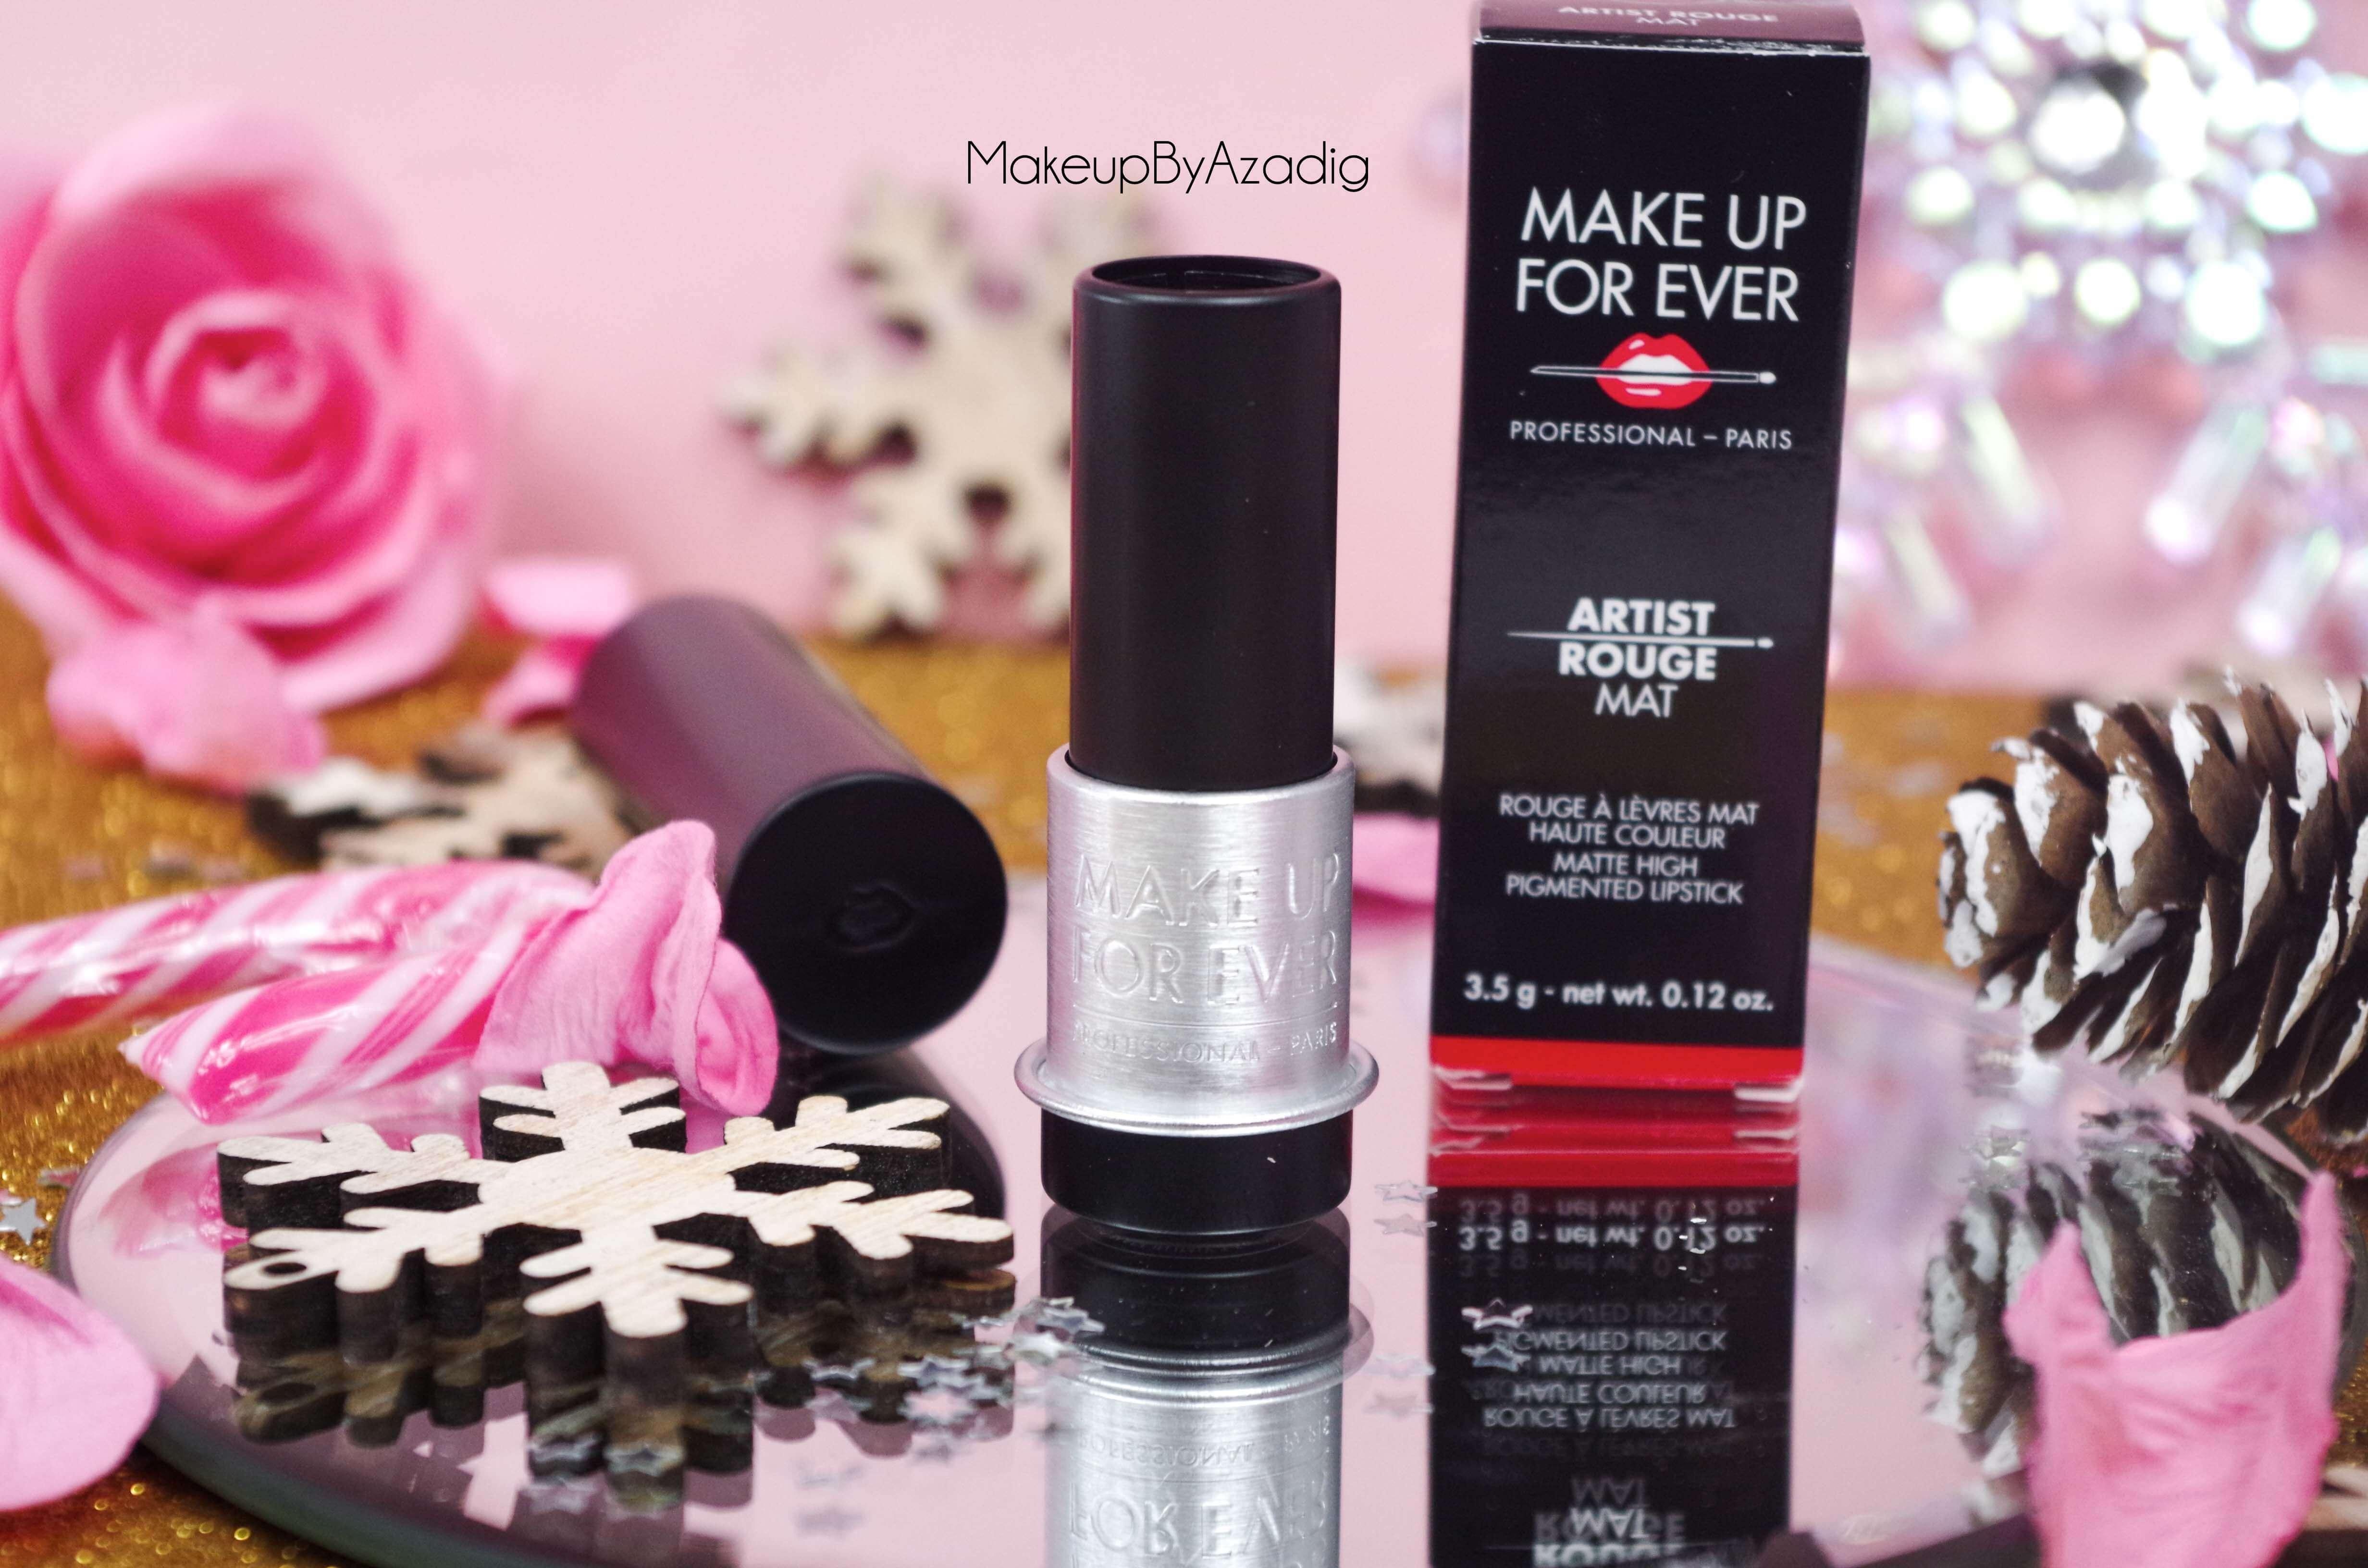 revue-artist-rouge-makeup-for-ever-rouge-levres-mat-sephora-prix-avis-review-m102-makeupbyazadig-tube